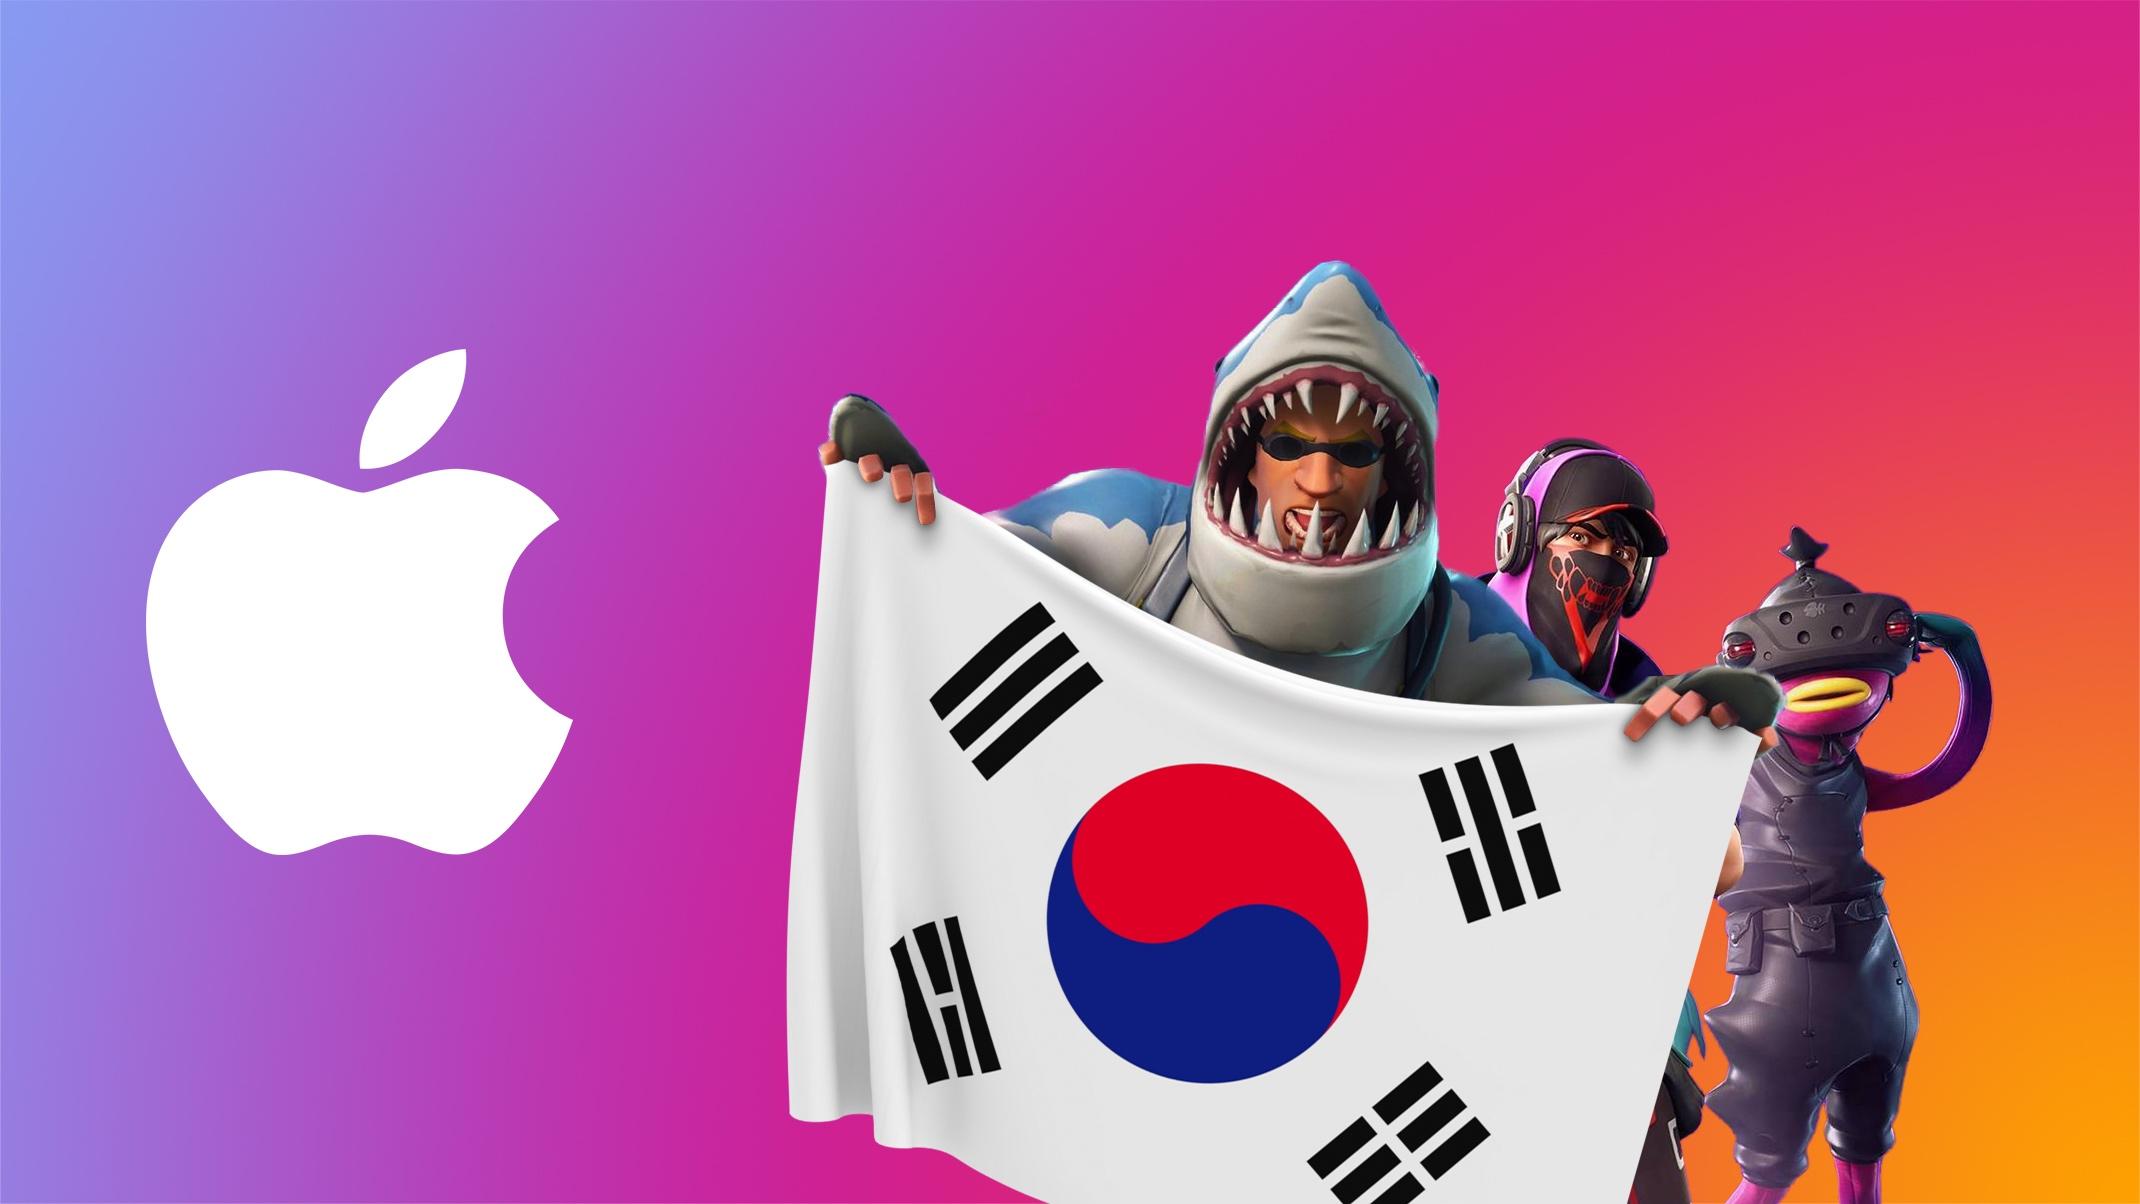 fortnite-apple-logo-south-korea-feature-1.jpg